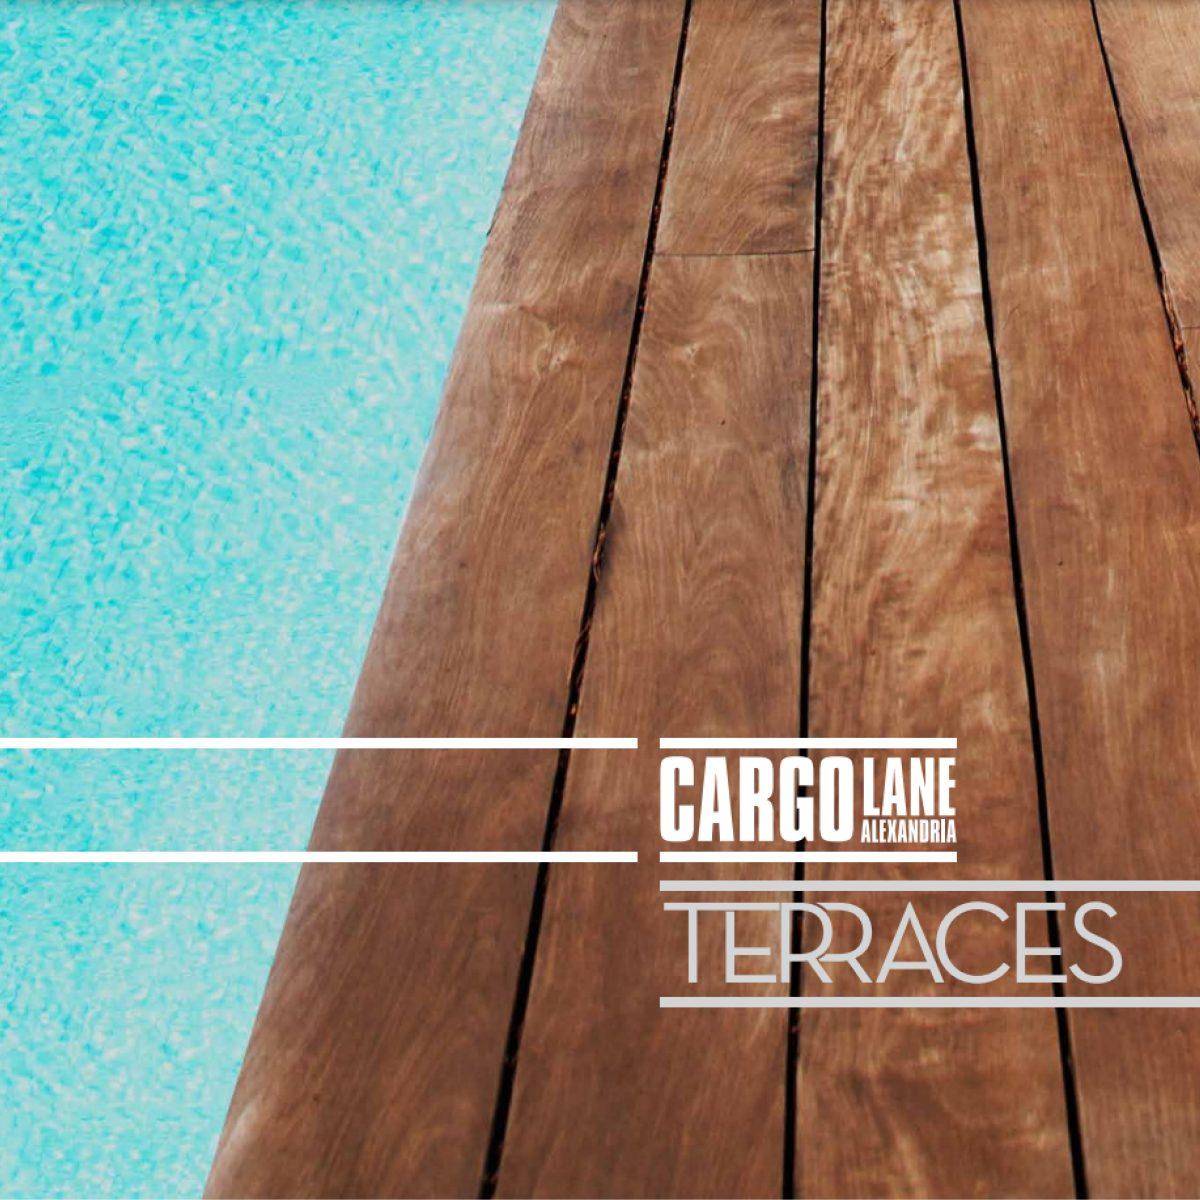 Cargo Lane Terraces Brochure